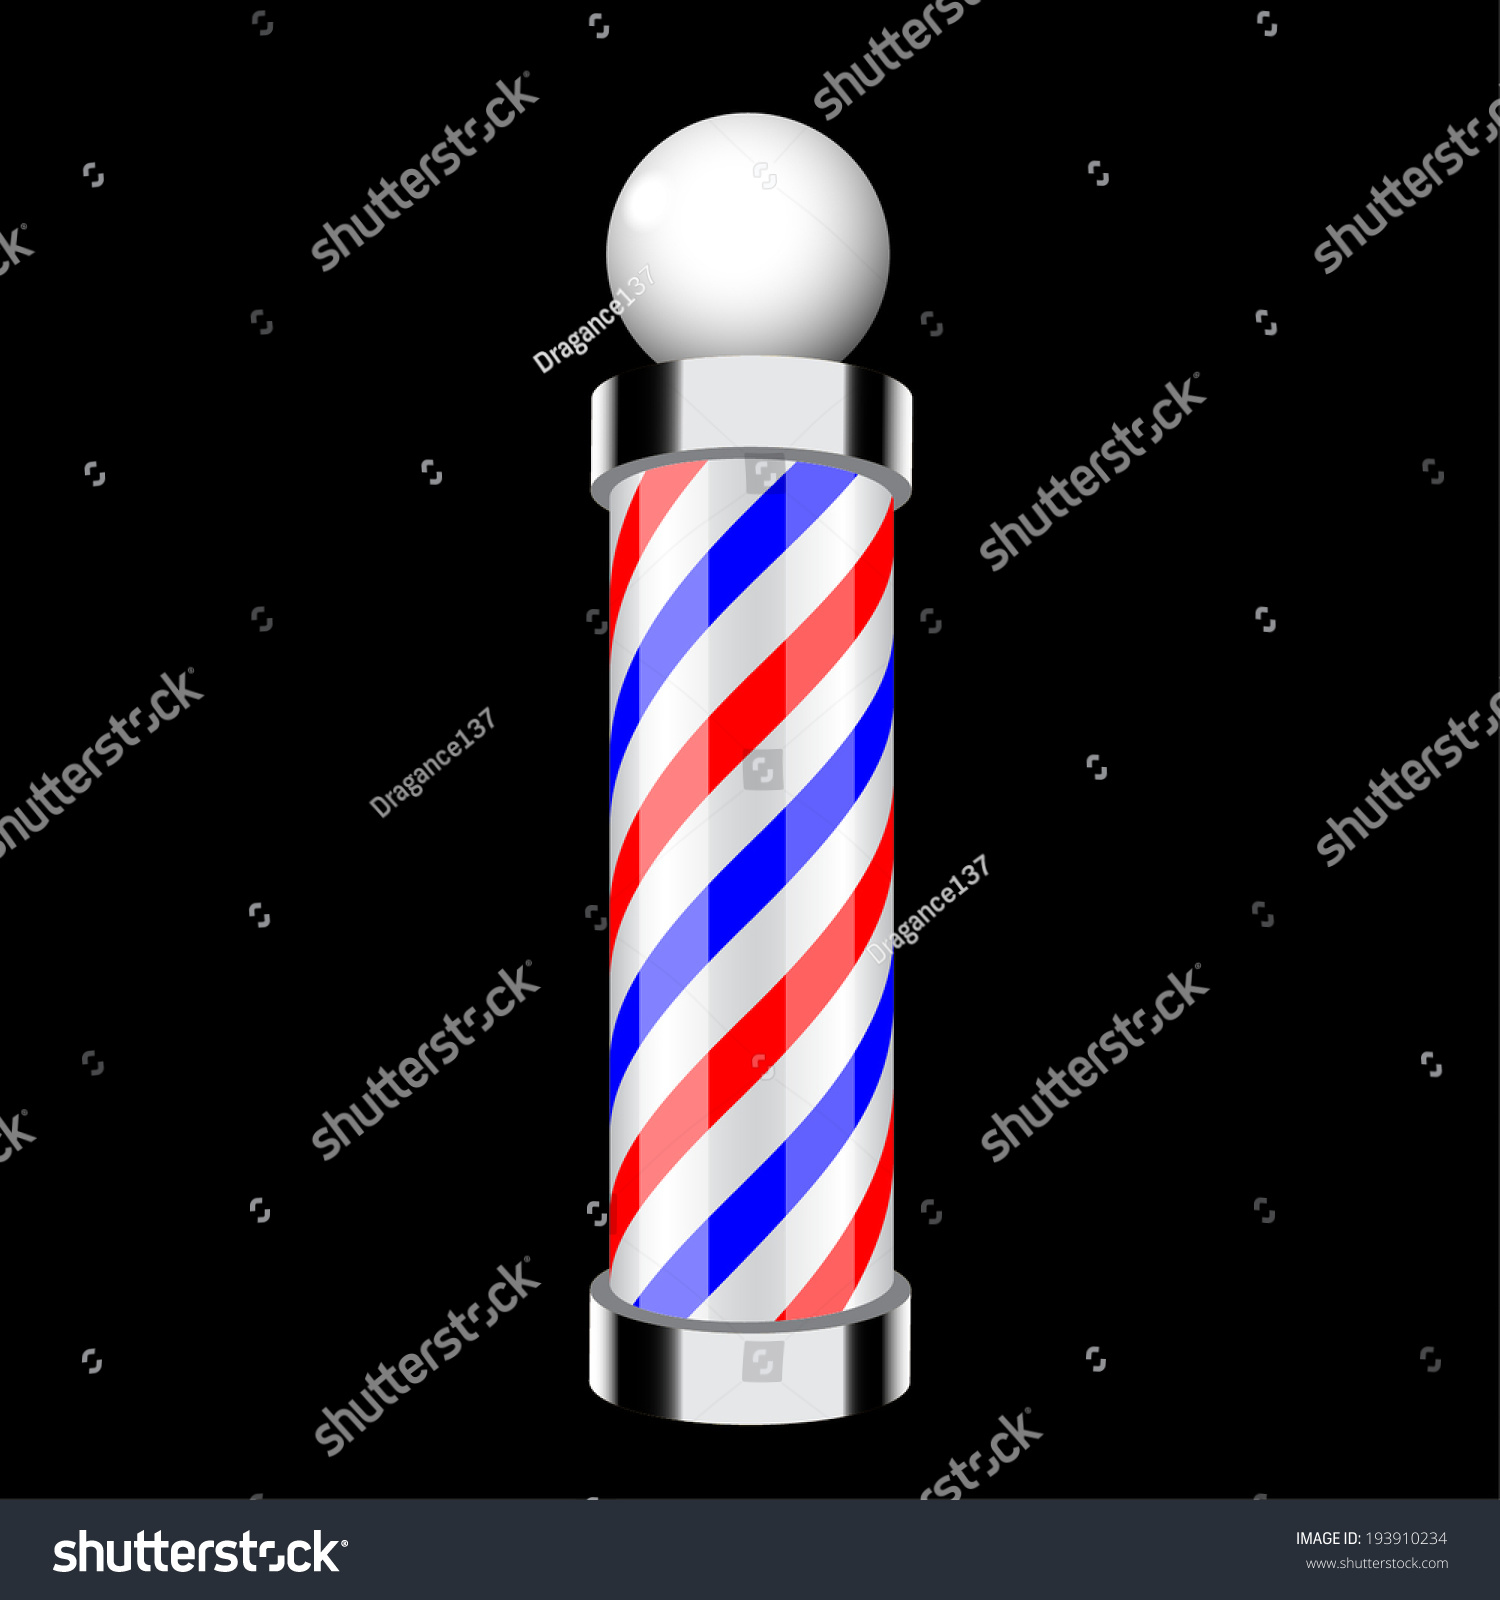 Barber pole своими руками 36